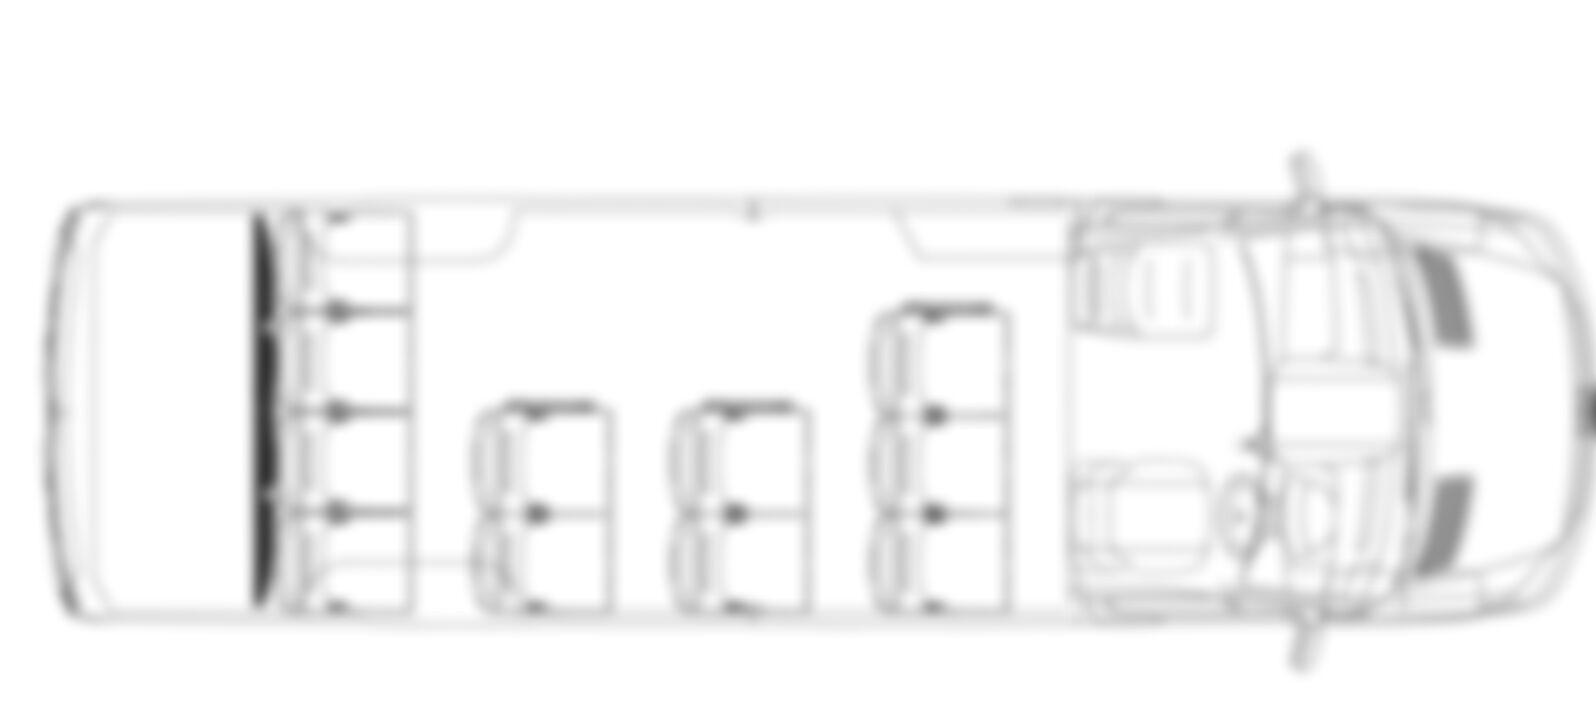 13 Seater Option 1